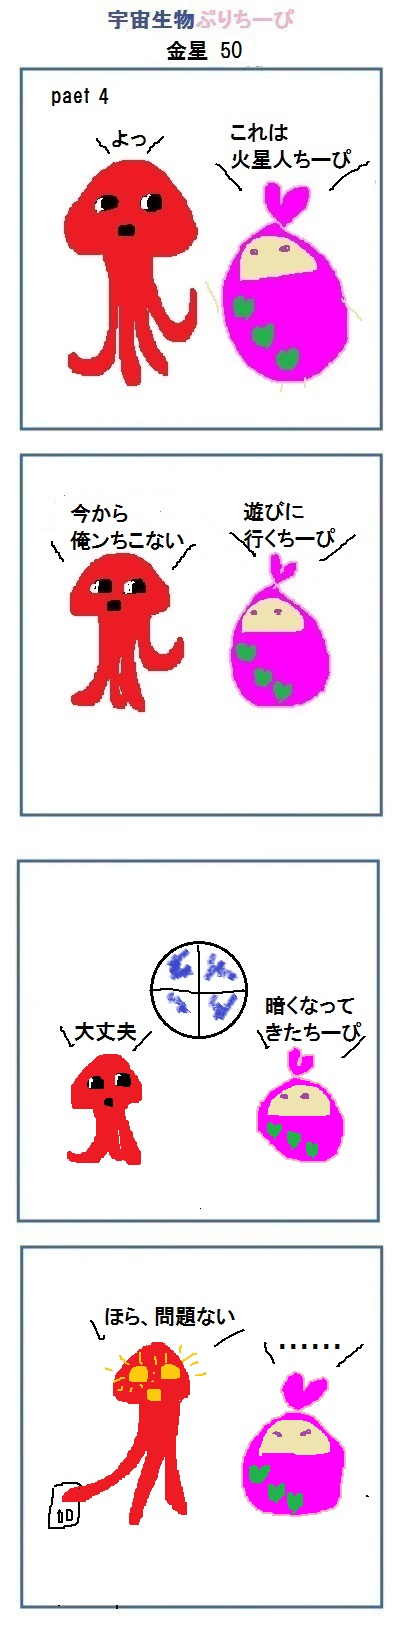 160723_kinsei50.jpg